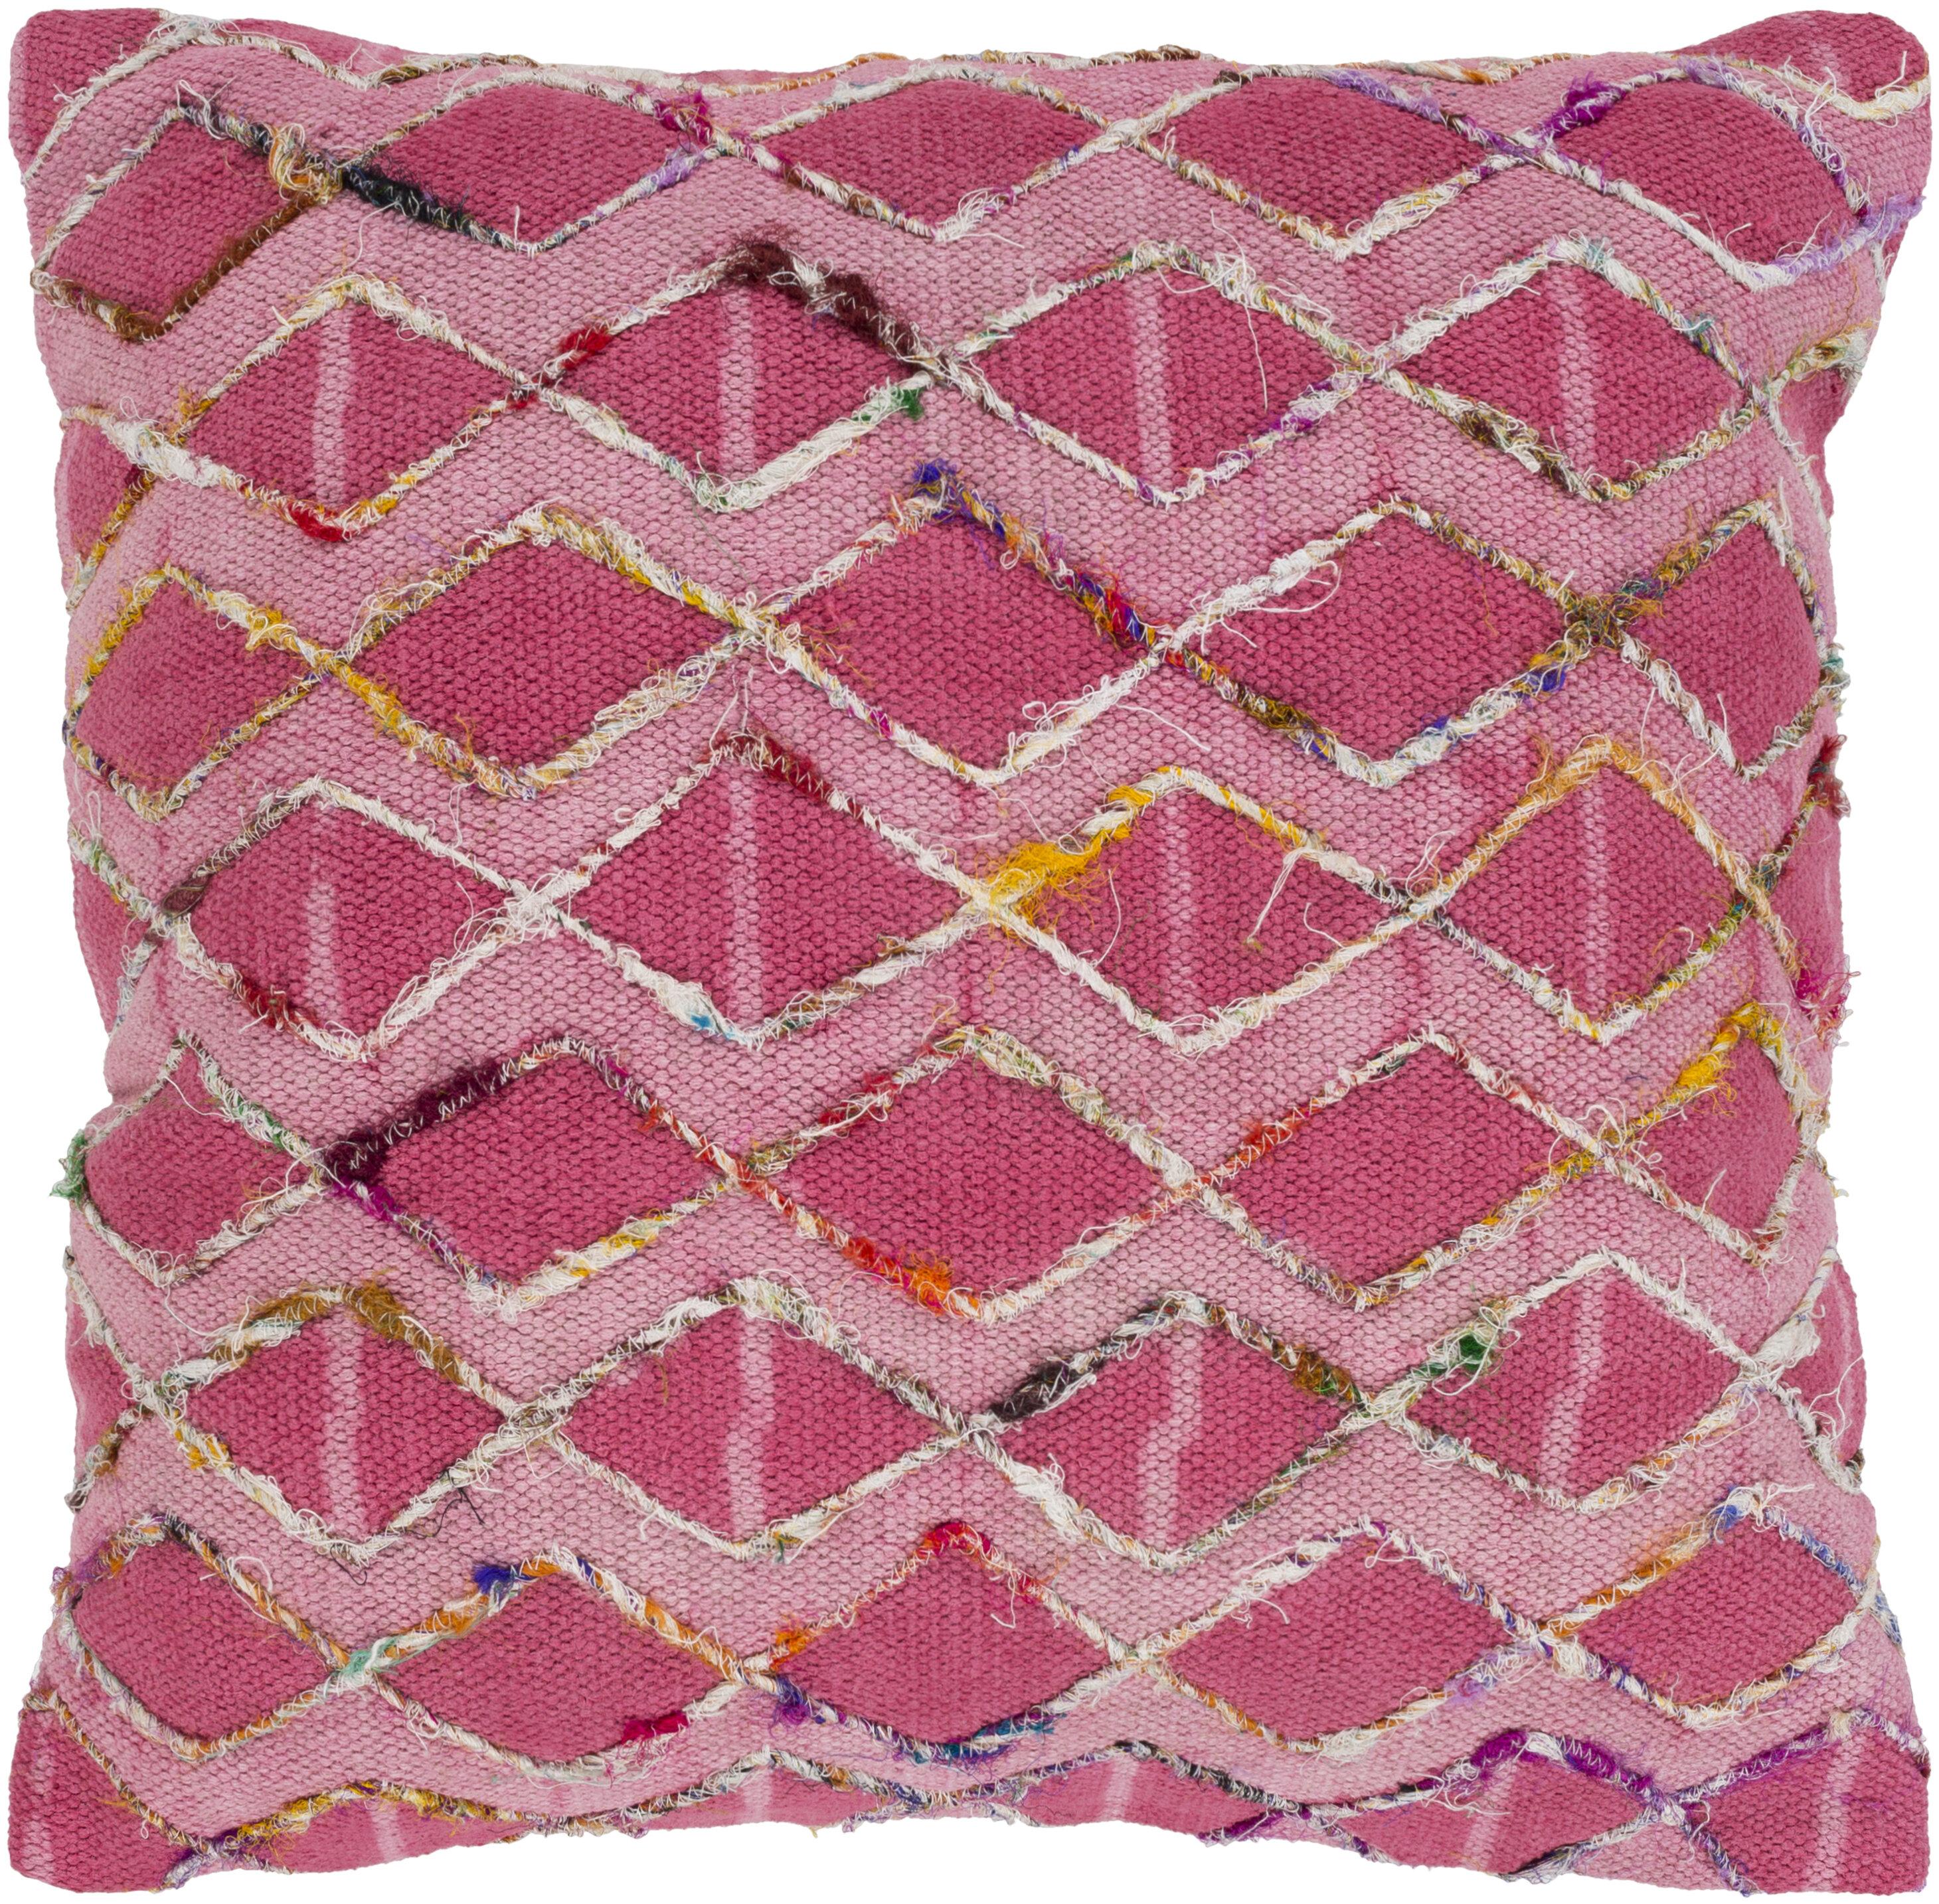 Union Rustic Cooke Cotton Throw Pillow Cover Reviews Wayfair